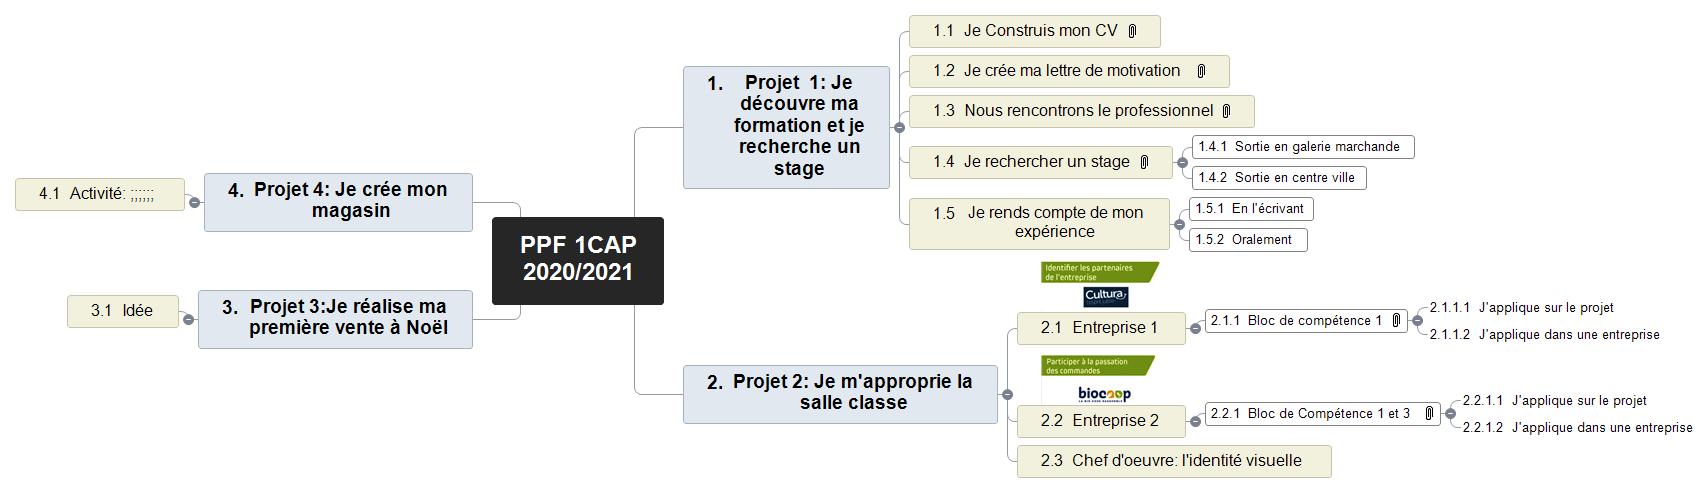 PPF 1CAP 20202021 (1) Mind Maps